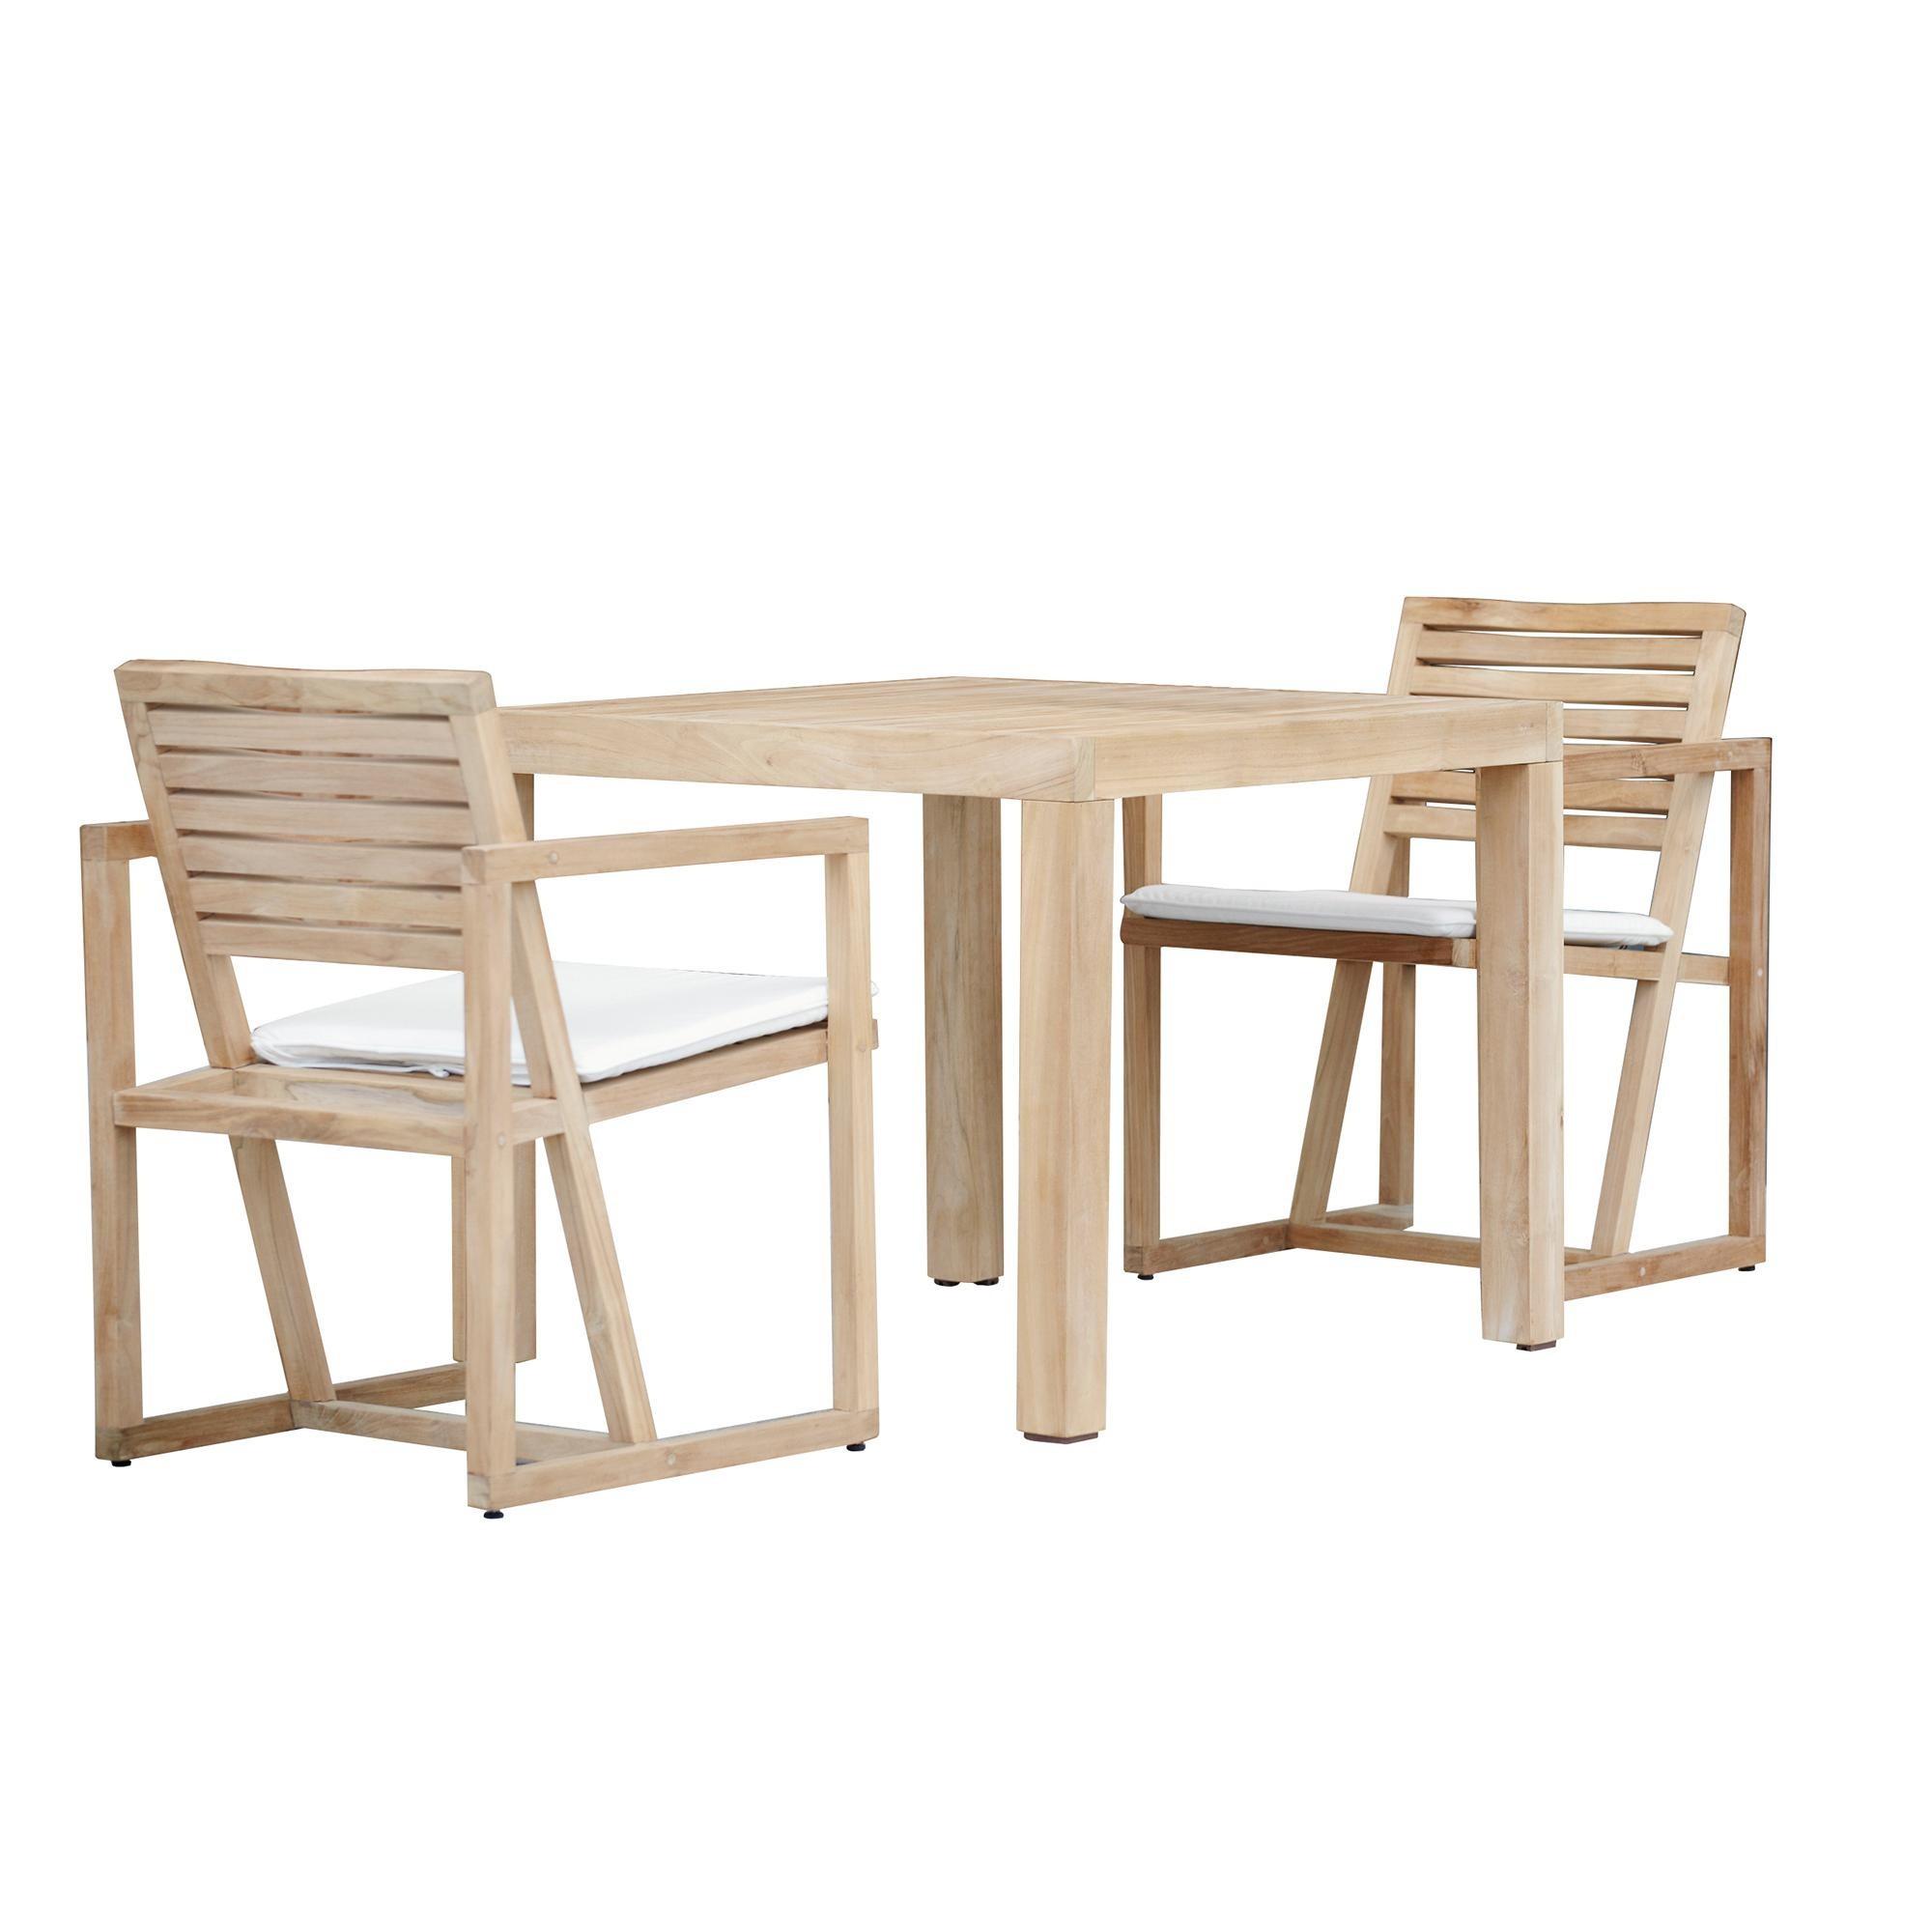 Jan Kurtz Timber Teakholz Gartenmöbel Set Ambientedirect